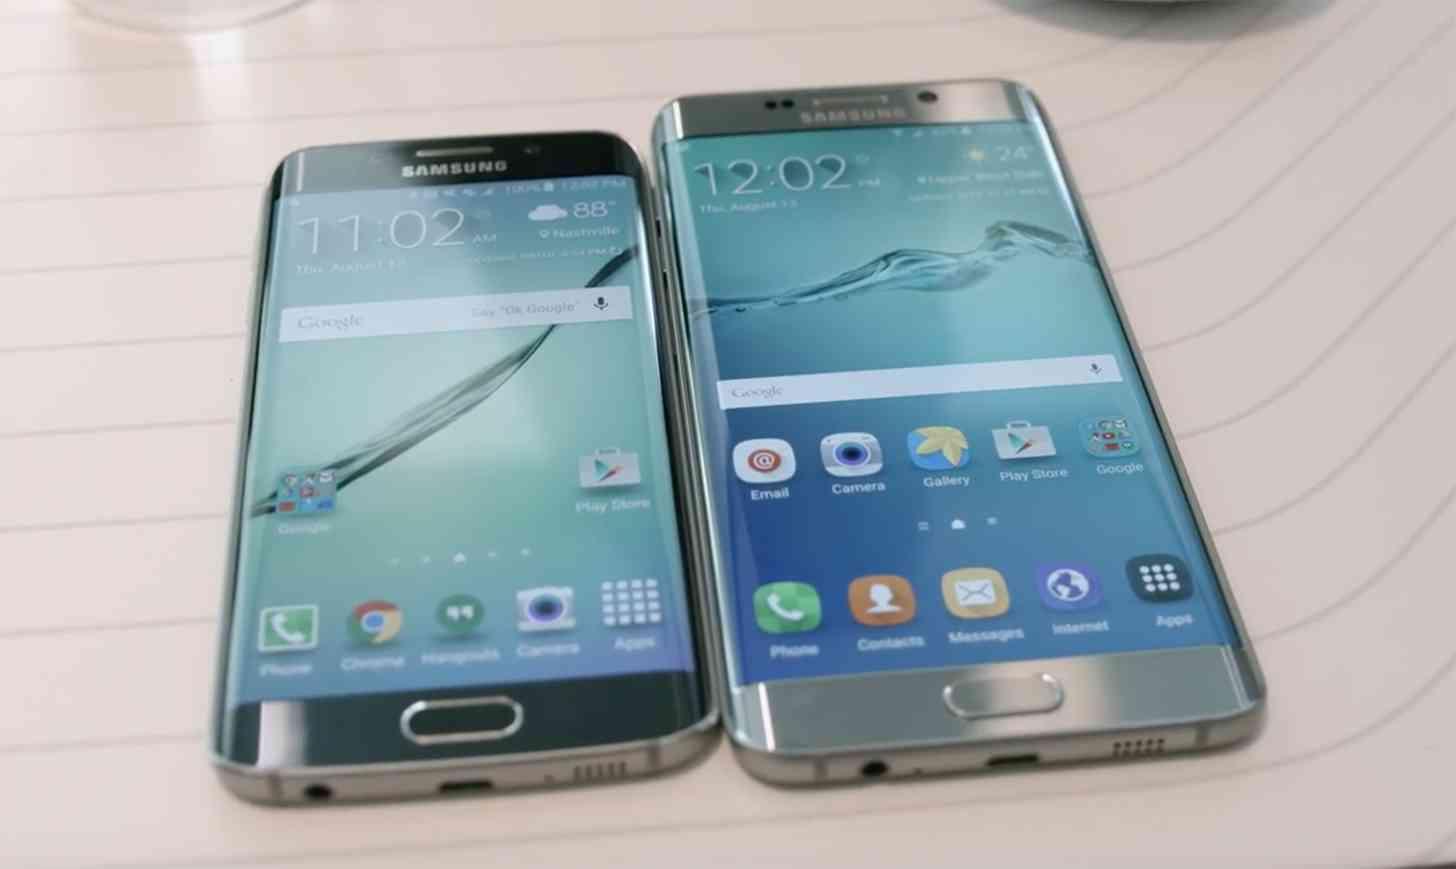 Samsung Galaxy S6 edge, S6 edge+ hands-on